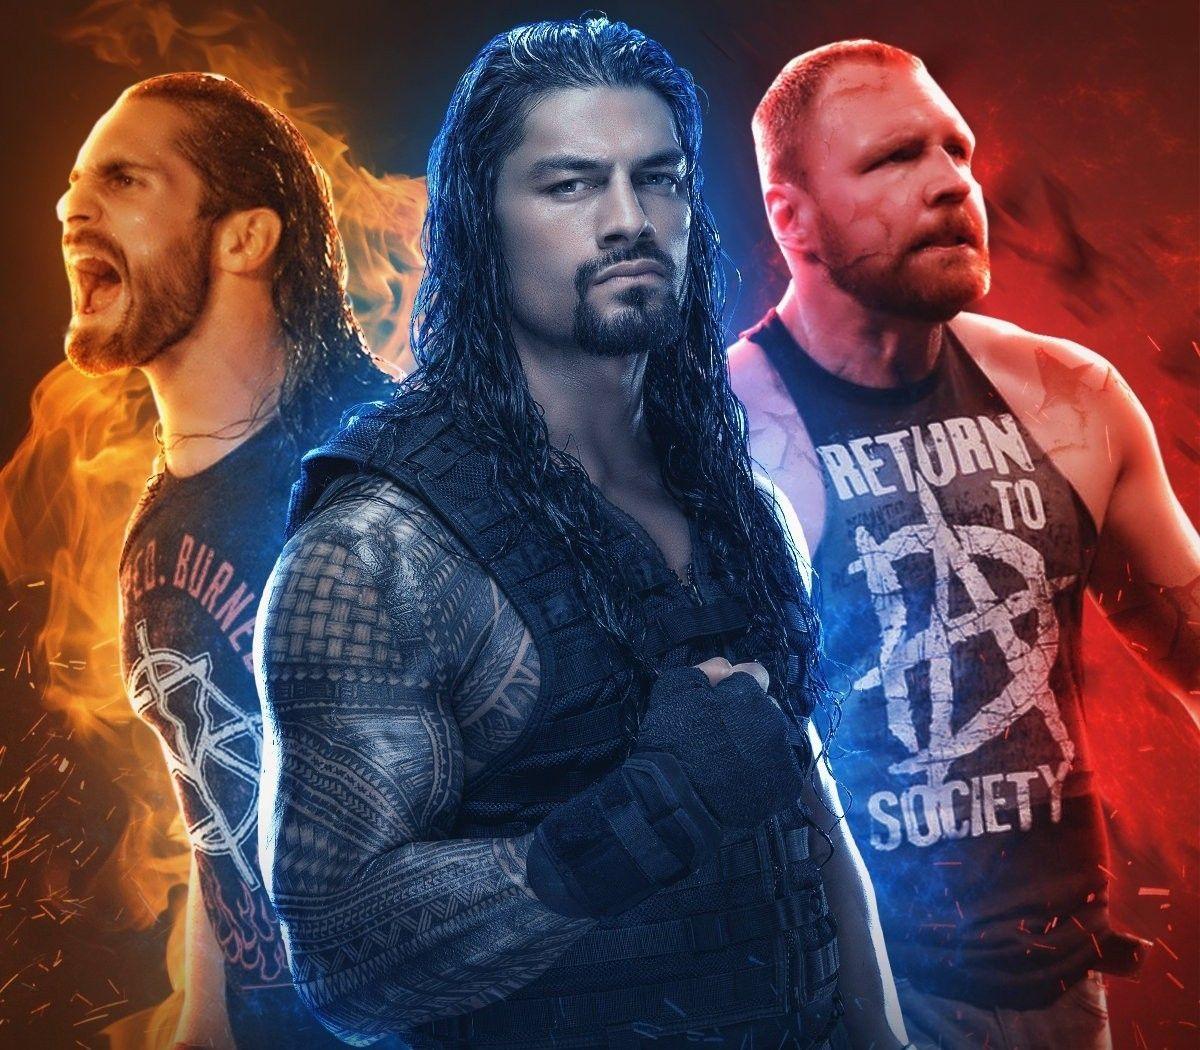 Seth Rollins Roman Reigns Dean Ambrose Believe In The Shield